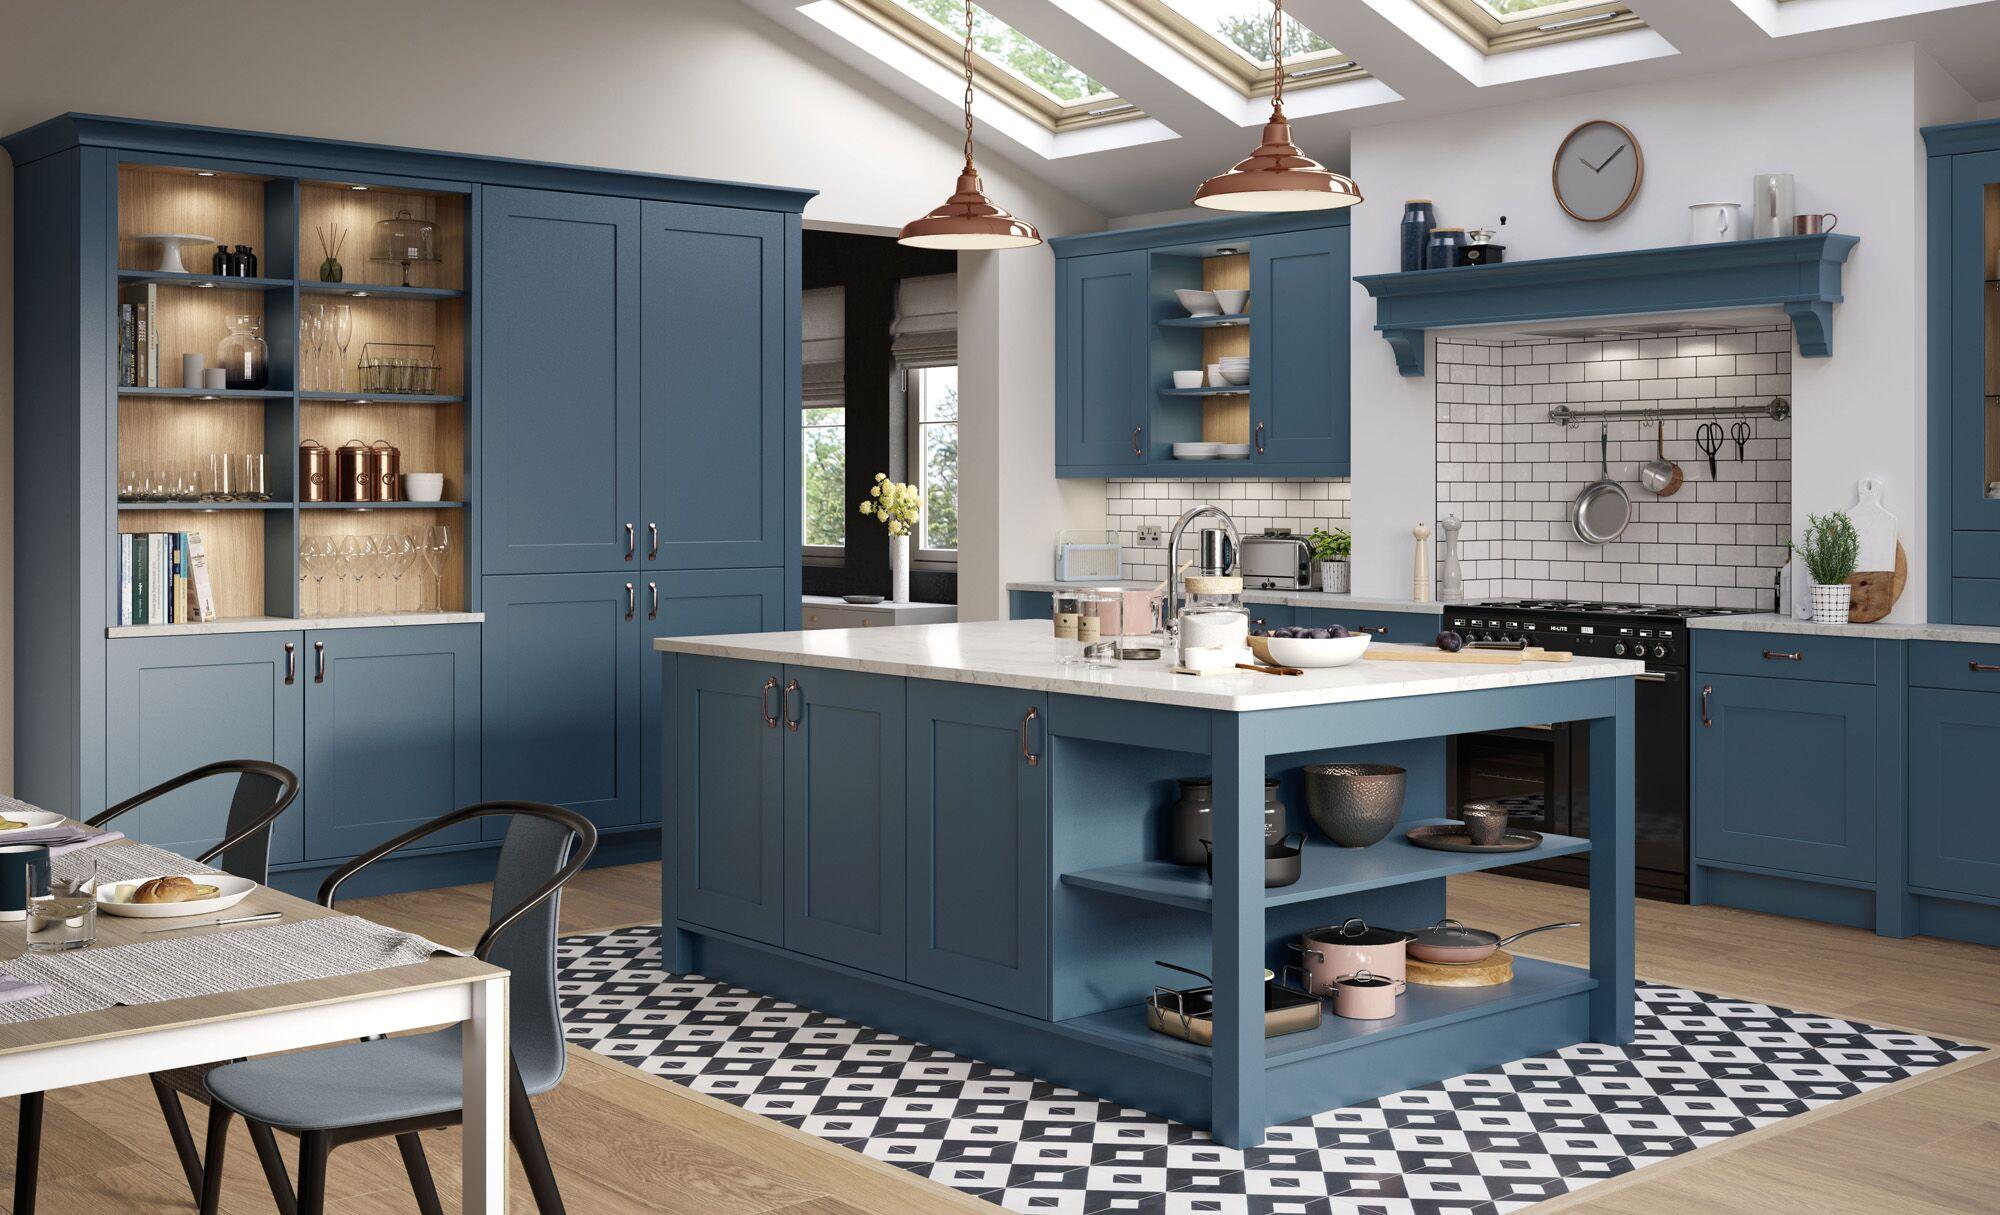 Modern Design Navy Blue Mdf Shaker Kitchen Cabinets Used